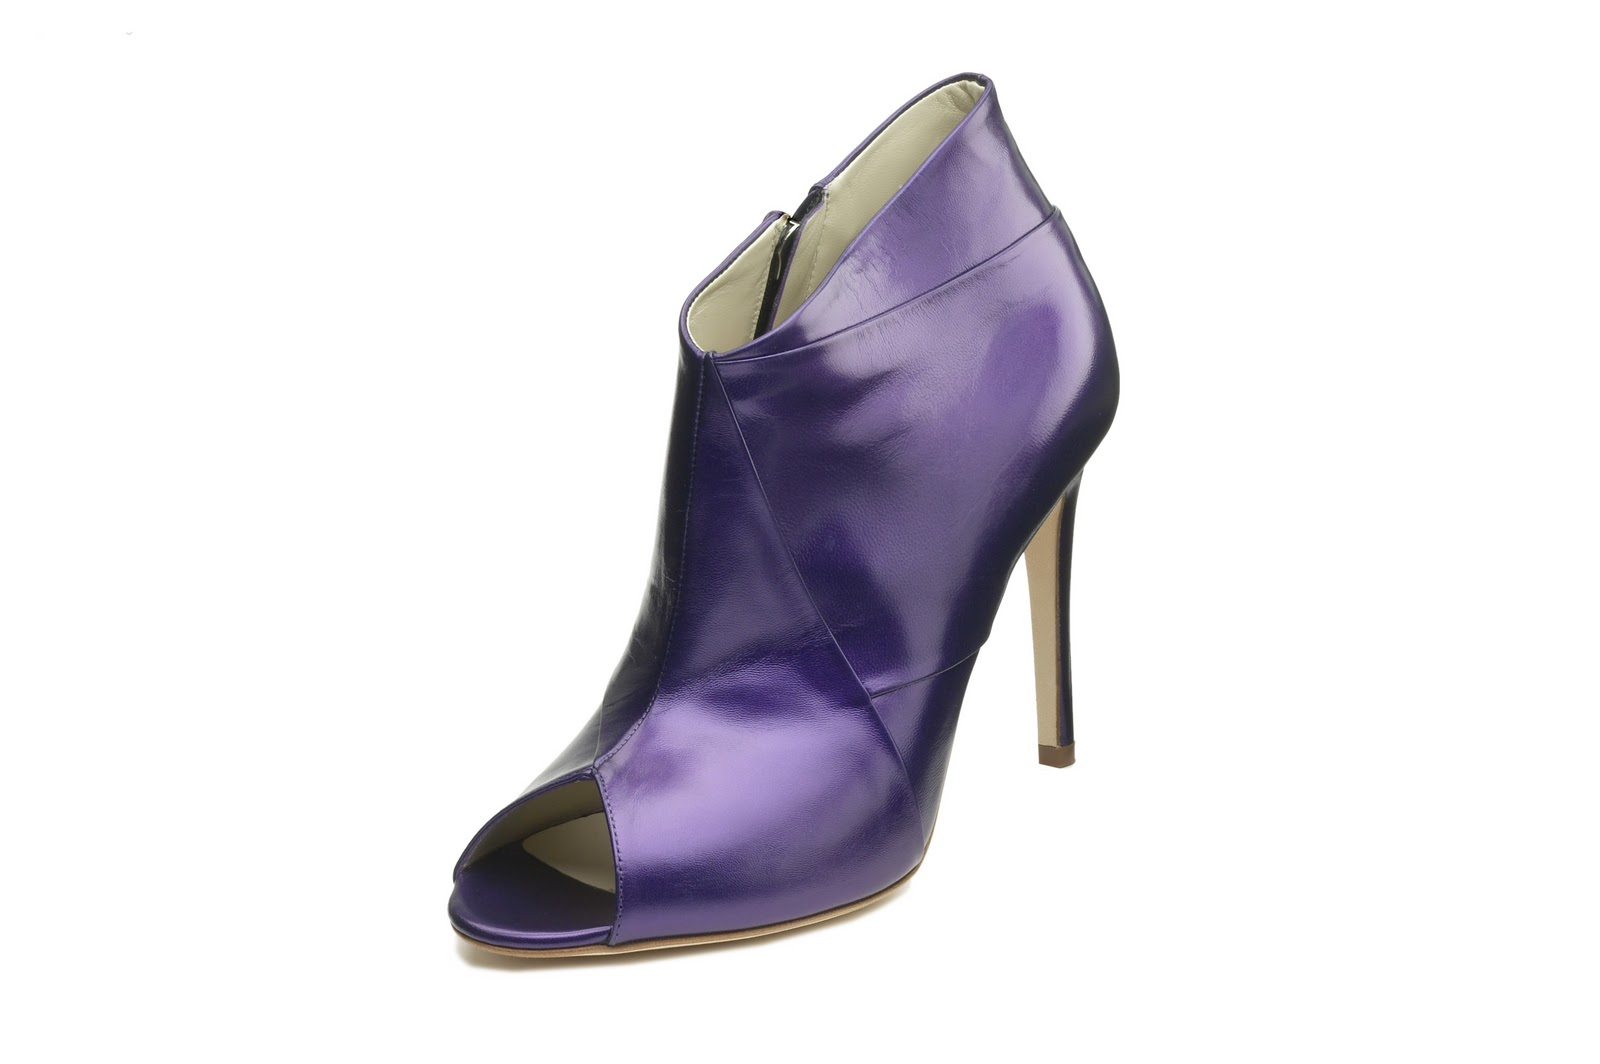 http://4.bp.blogspot.com/_O04YXmRrX3I/TLpF86KeTNI/AAAAAAAAAlU/zJcfozrv6Po/s1600/Rupert_Sanderson_Alcazar_9-830_purple17_calf.jpg